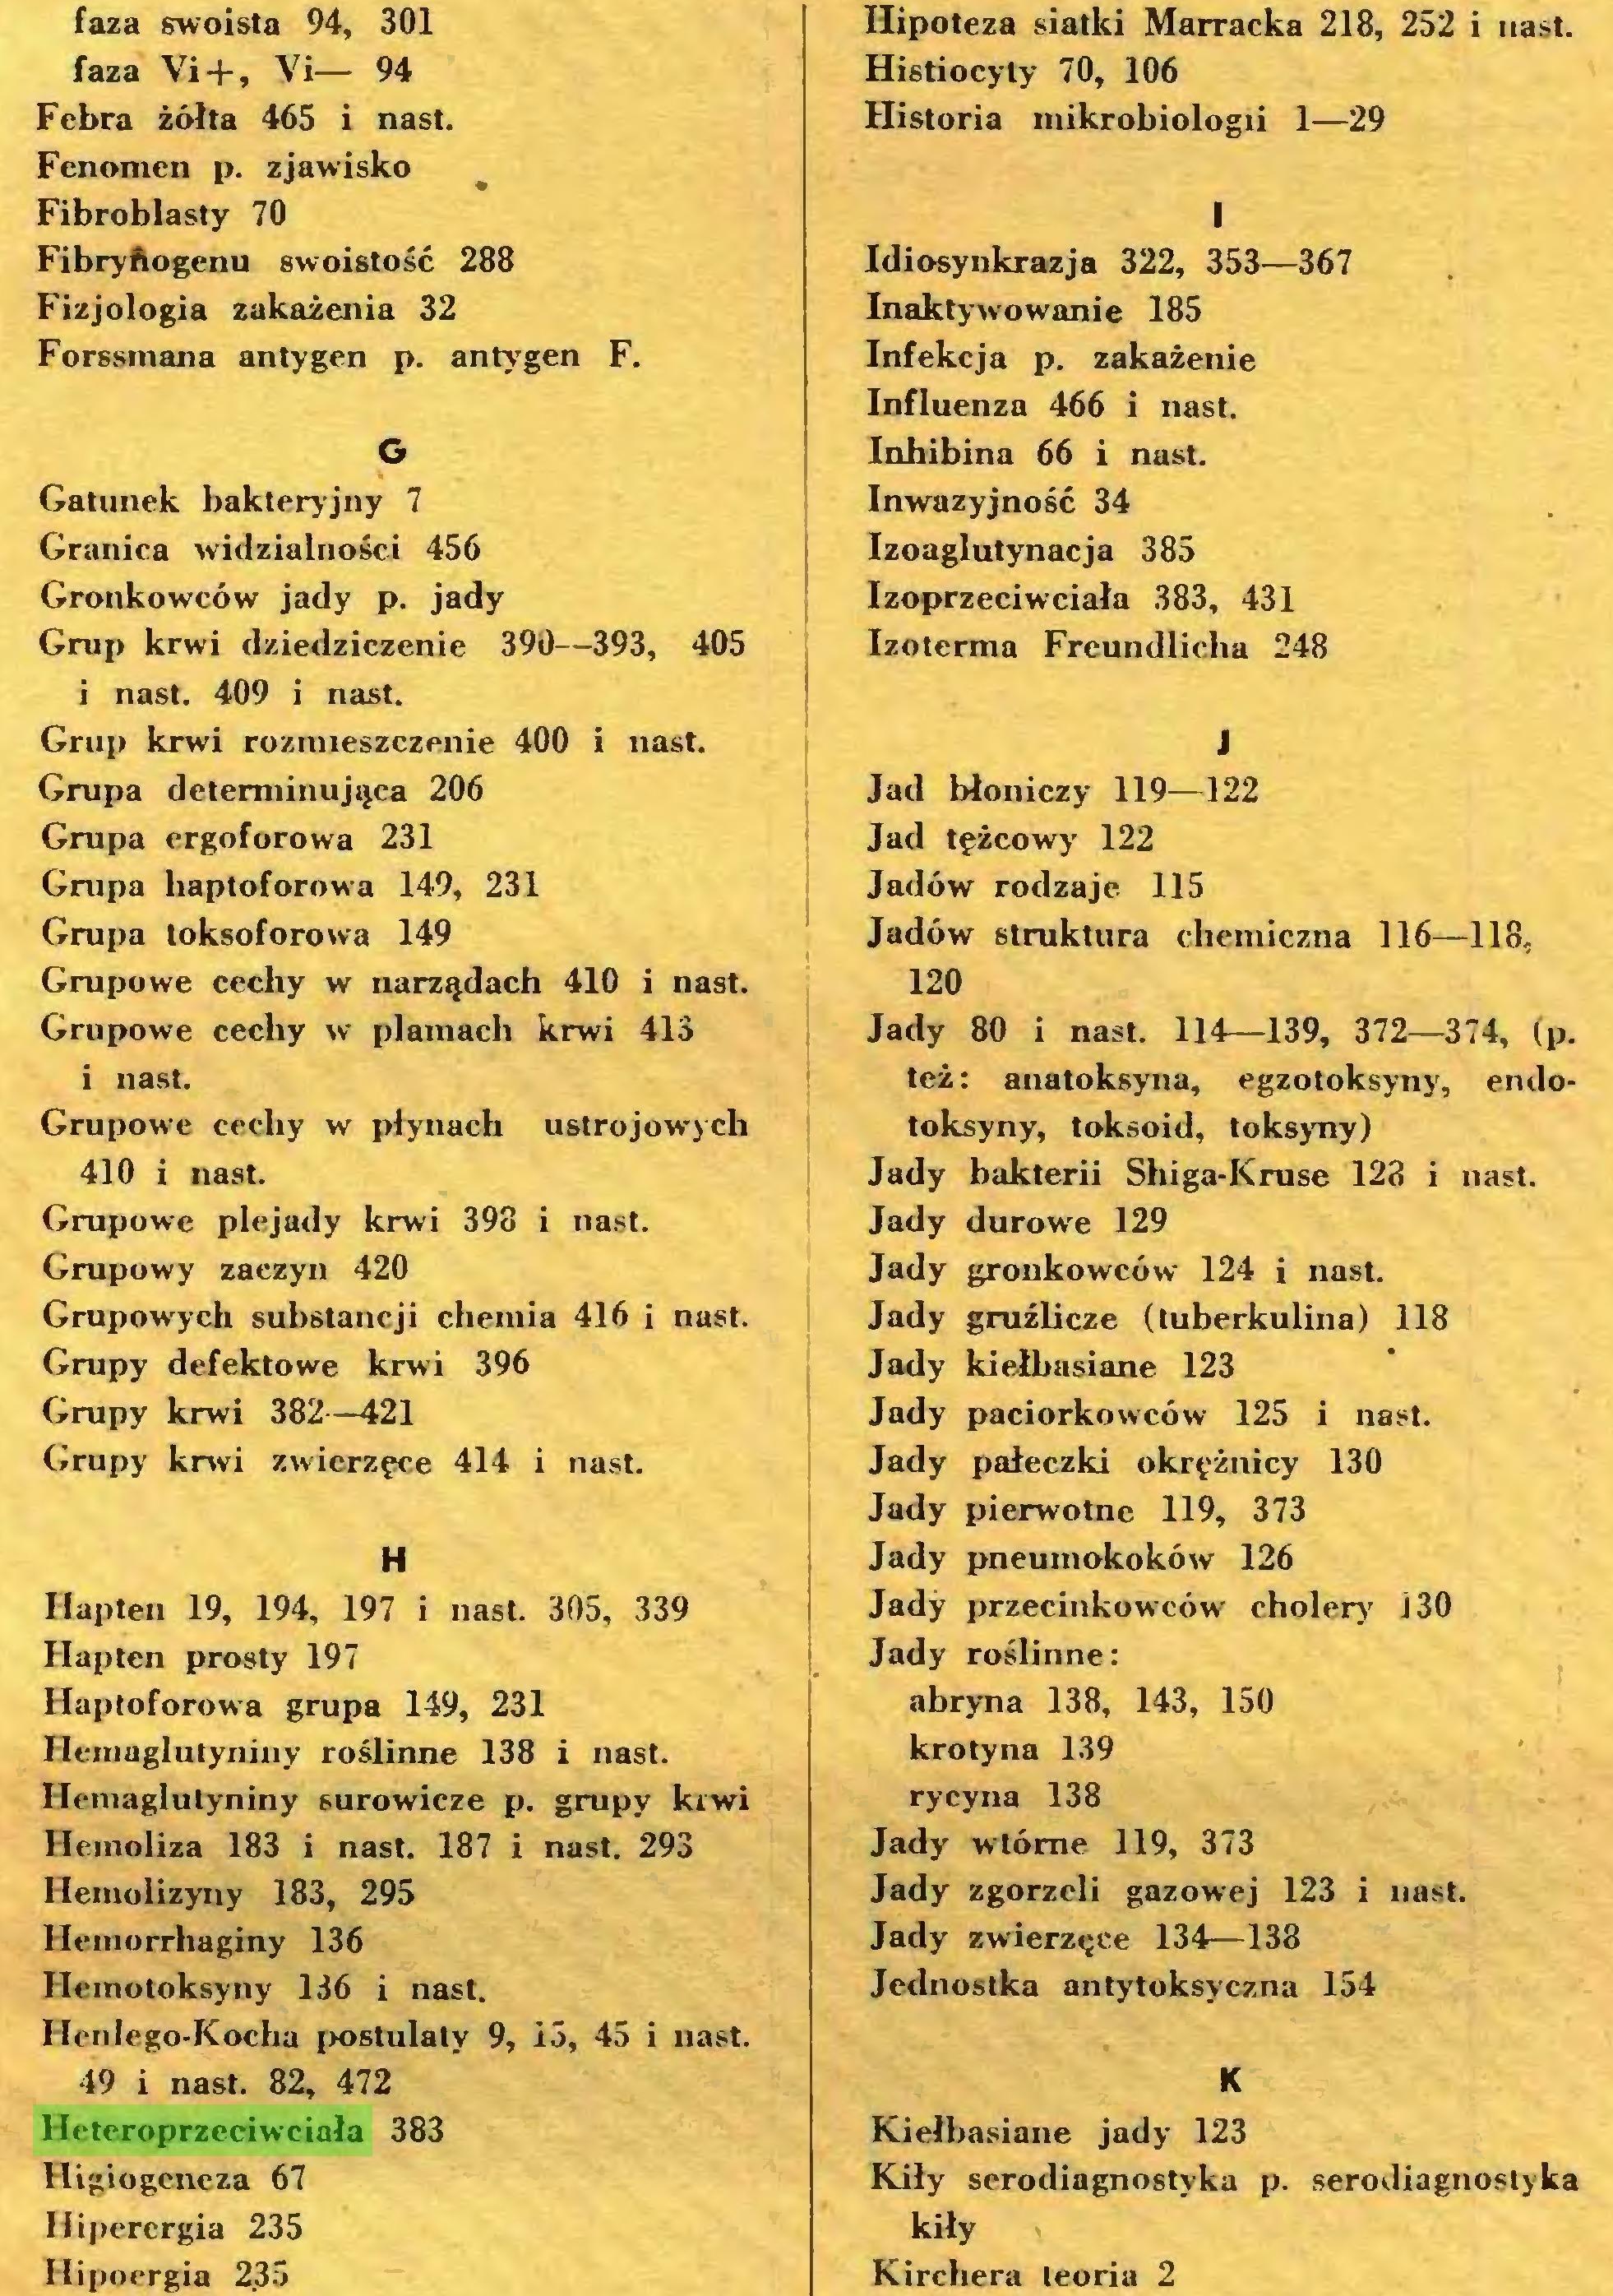 (...) 49 i nast. 82, 472 Heteroprzeciwciała 383 Higiogeneza 67 Iiipercrgia 235 Hipoergia 235 Hipoteza siatki Marracka 218, 252 i nast...